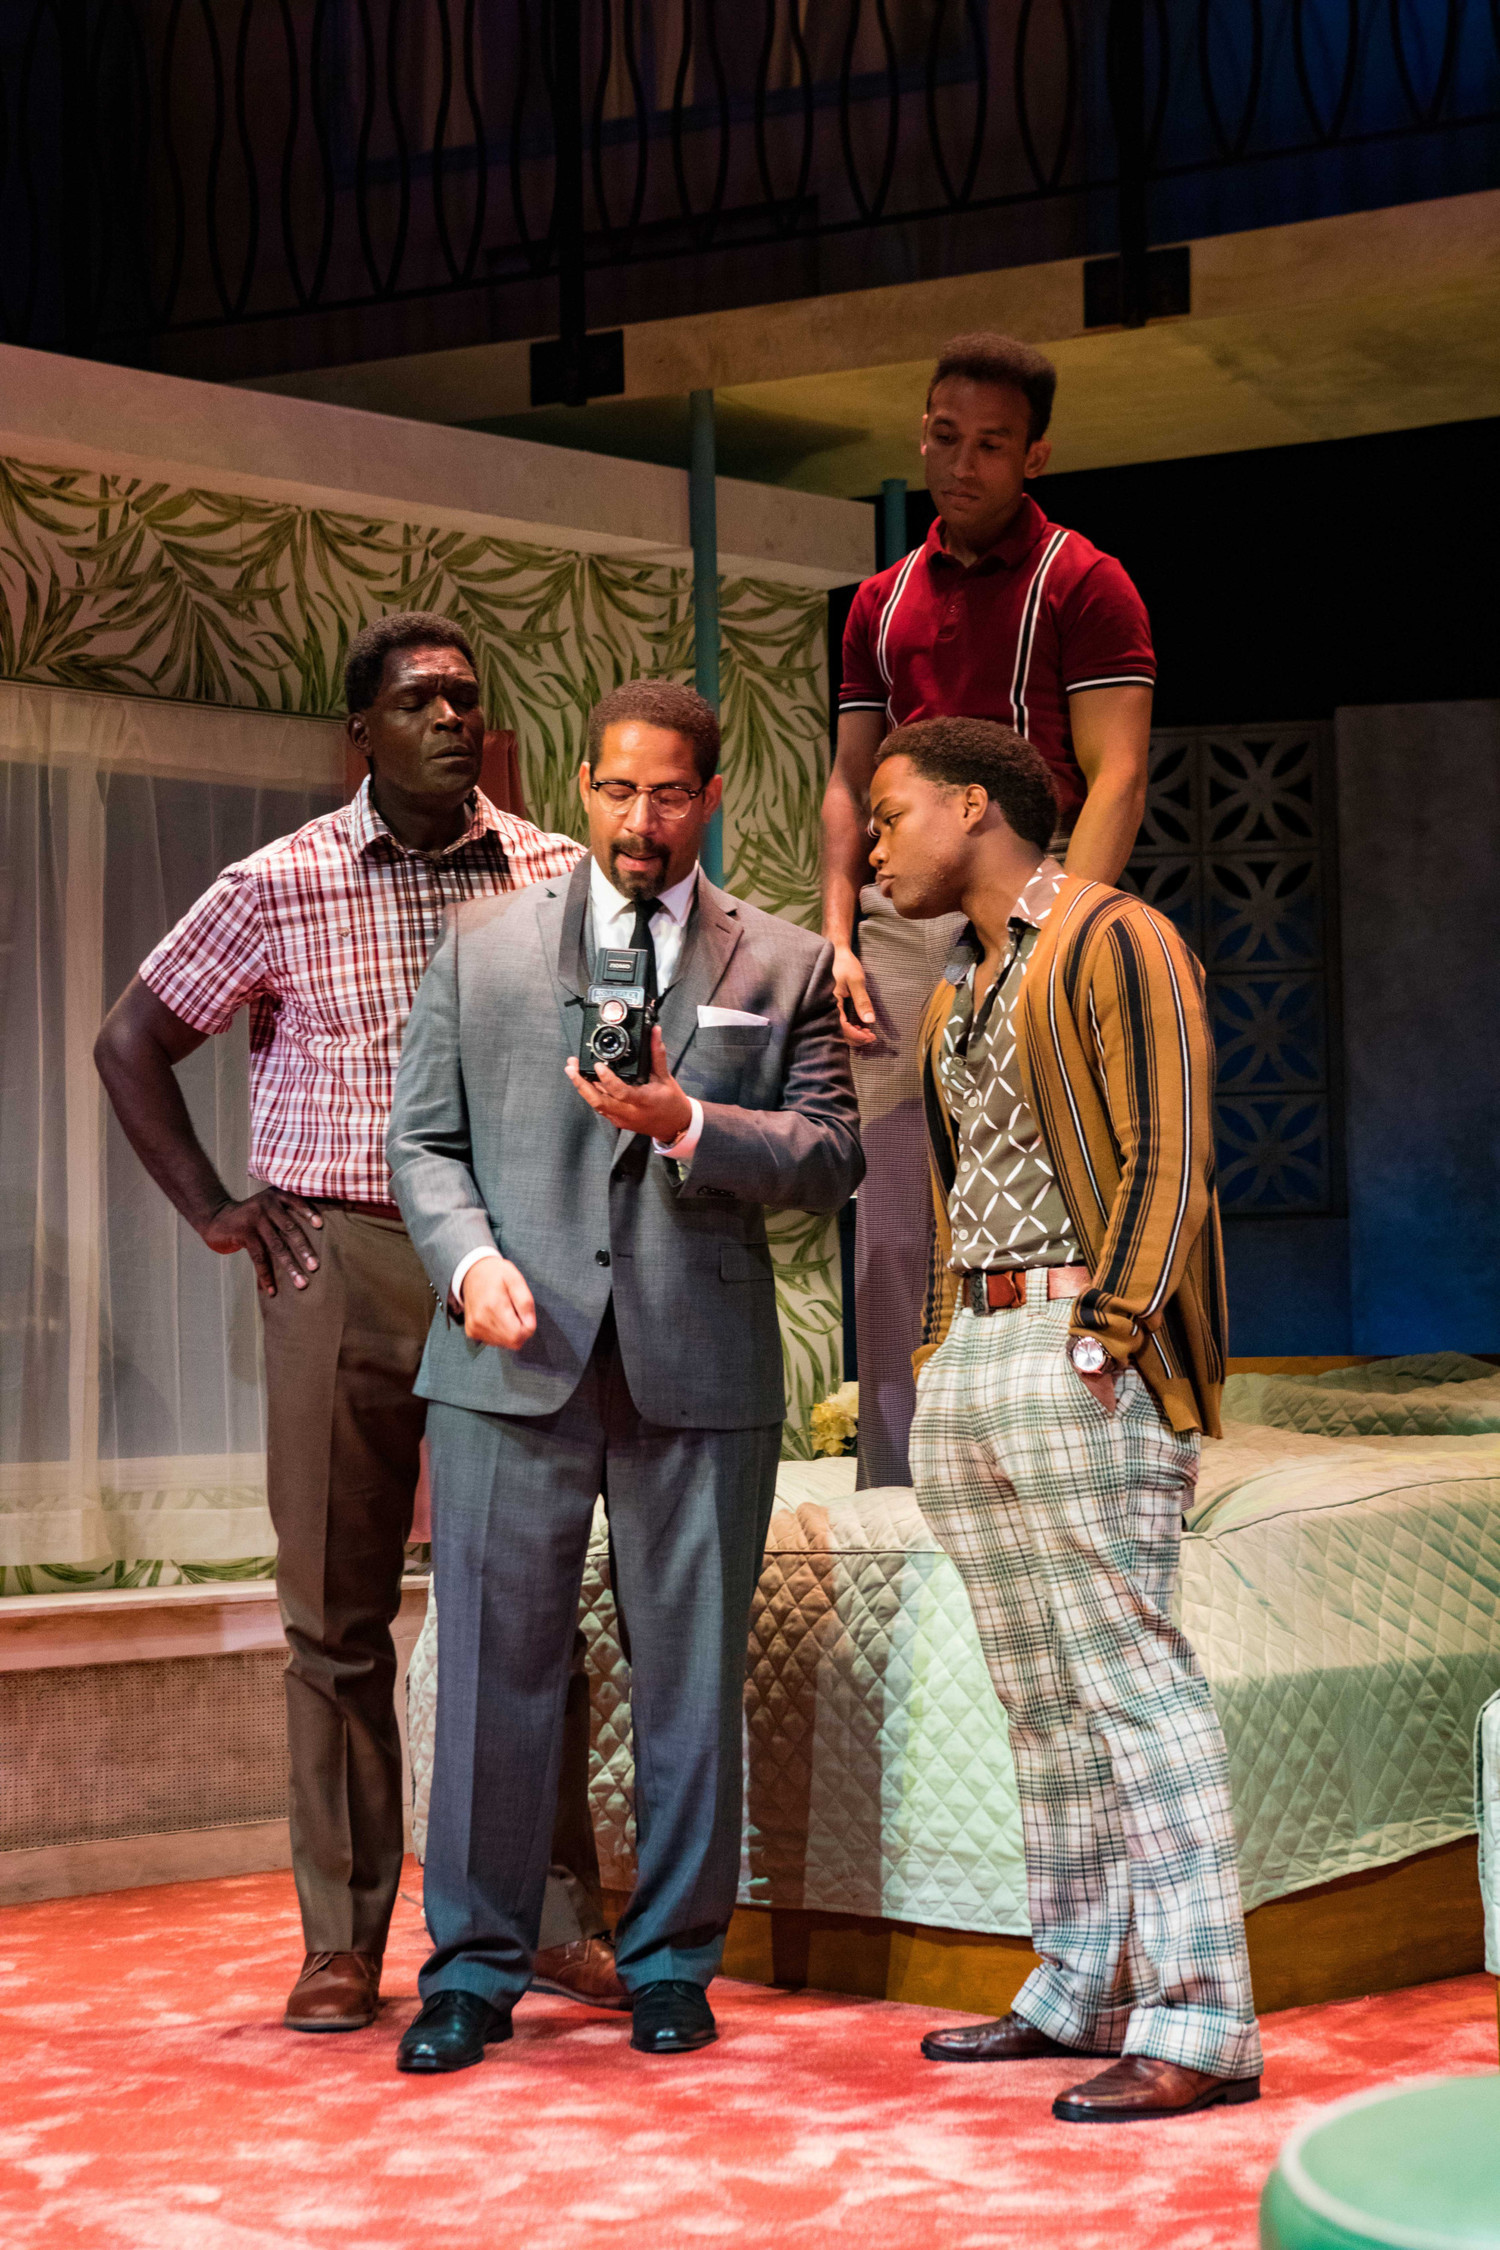 BWW Review: ONE NIGHT IN MIAMI at Miami New Drama